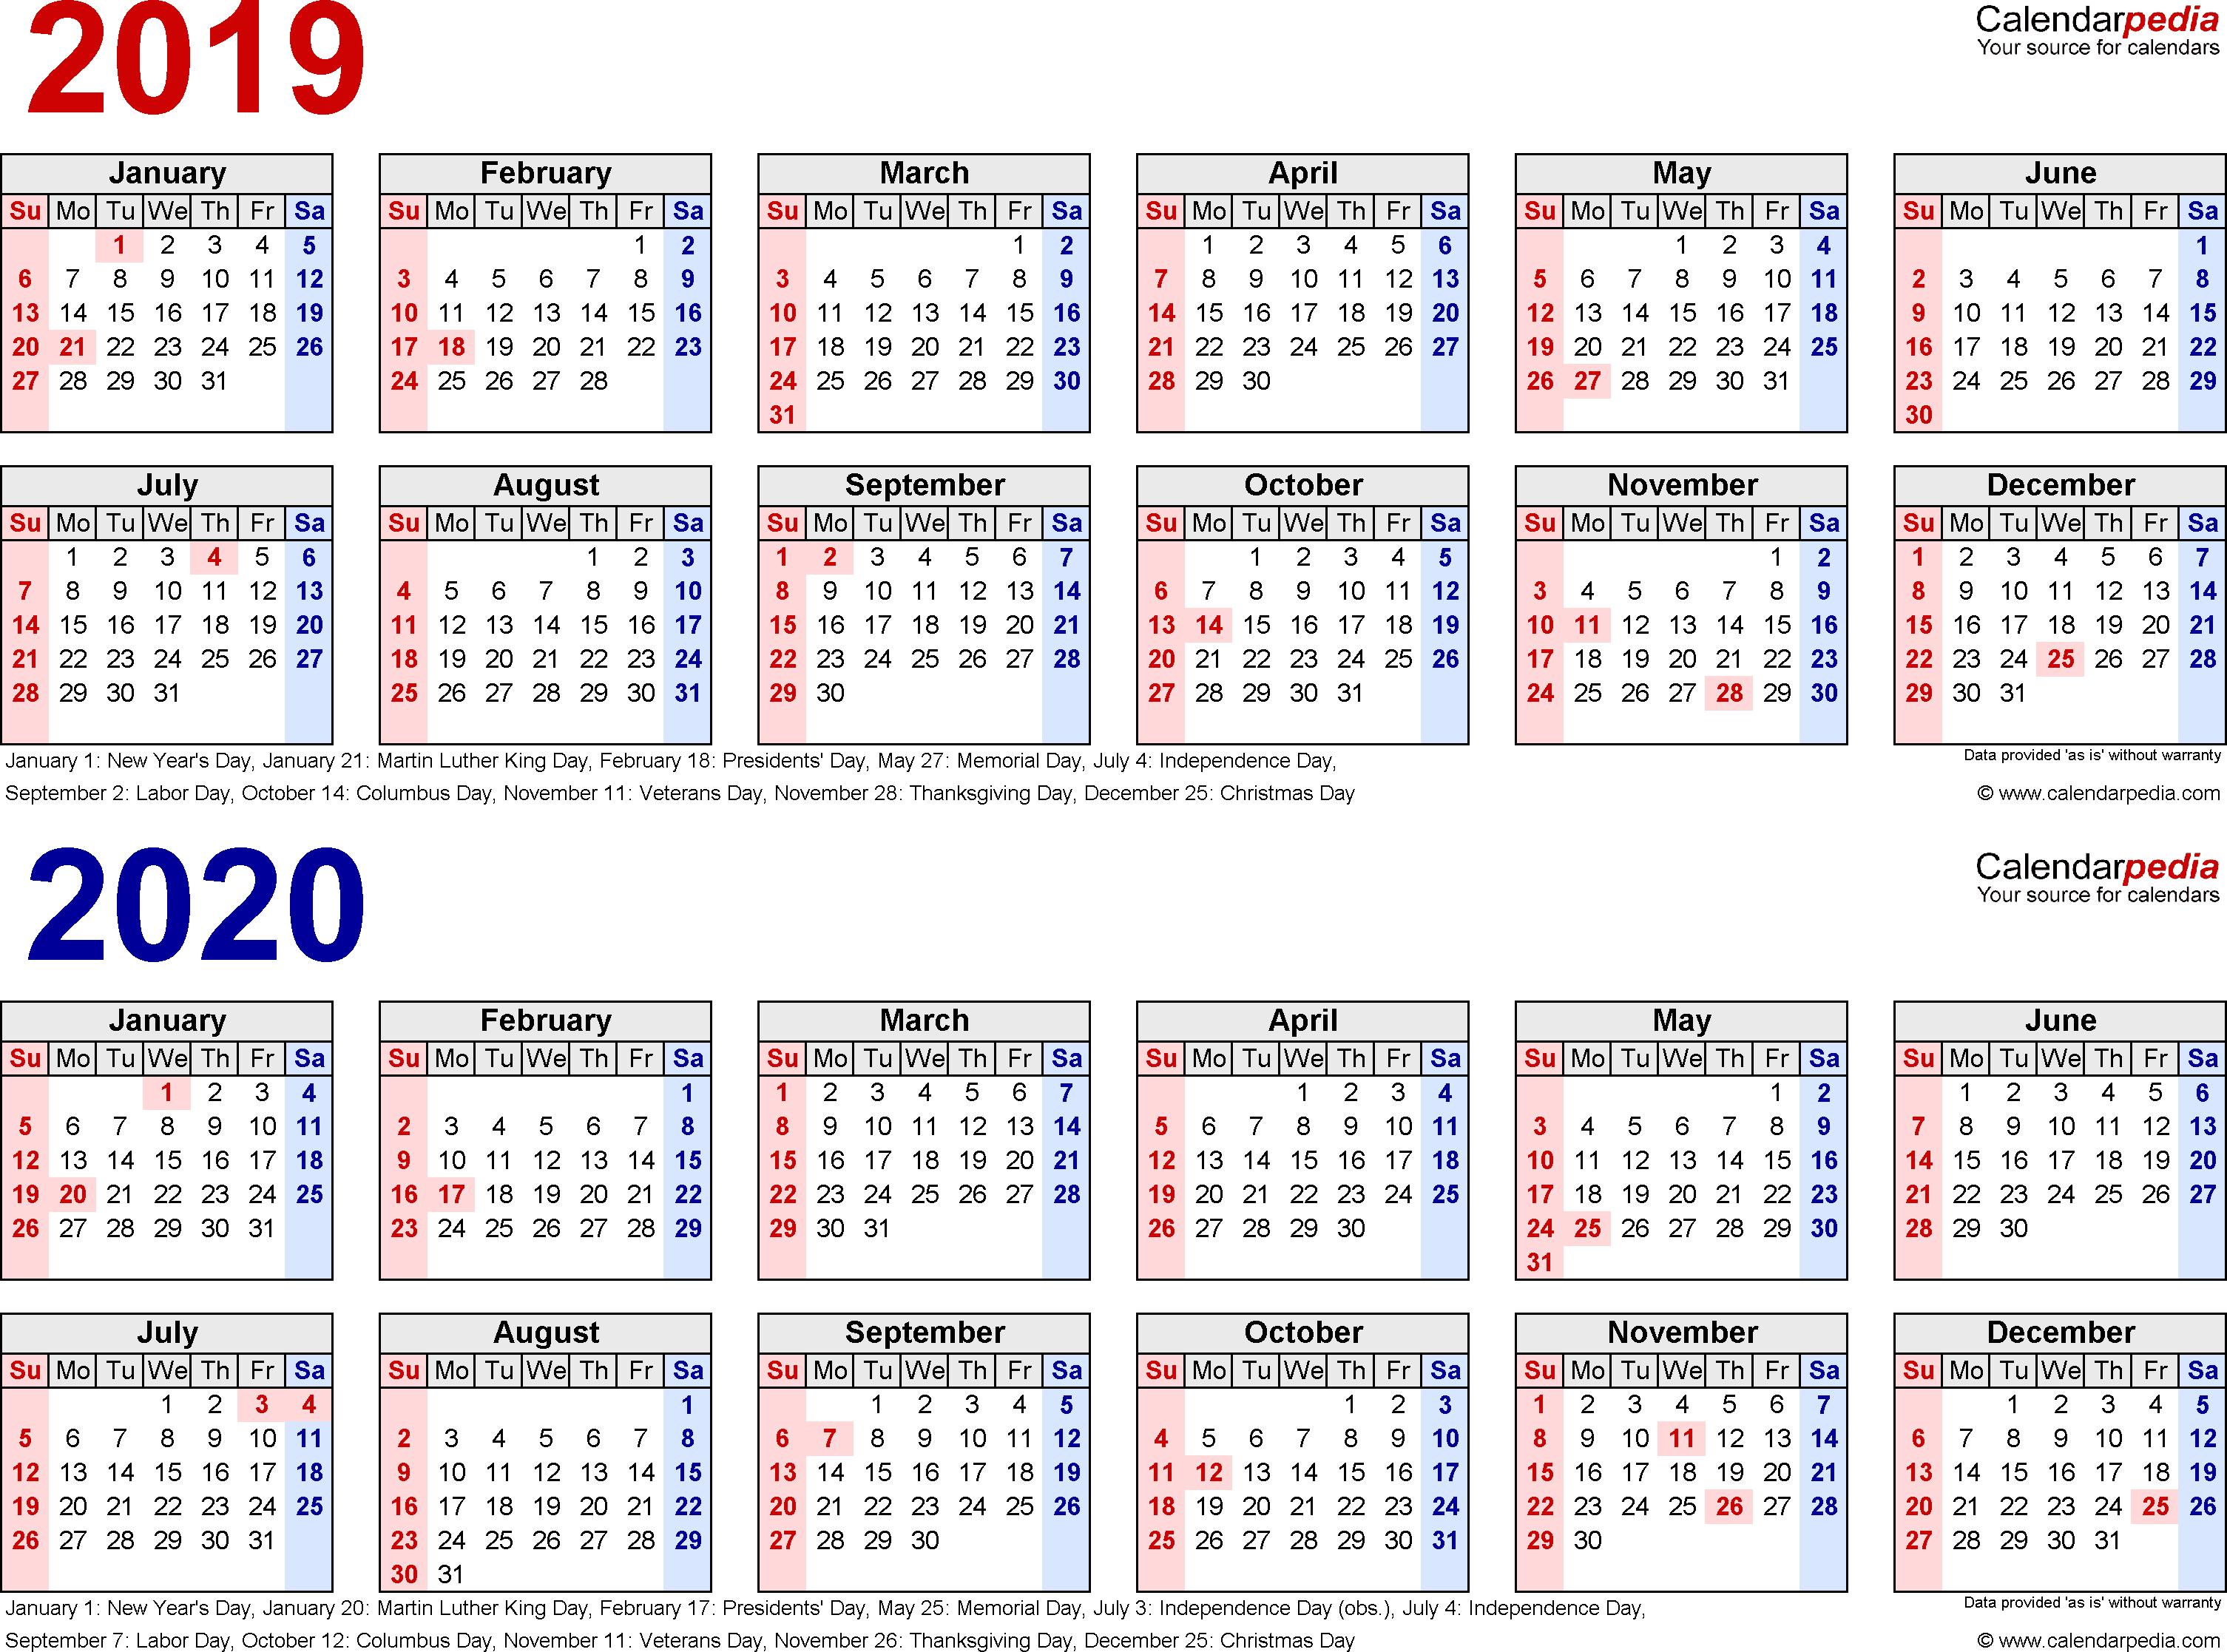 2019-2020 Calendar - Free Printable Two-Year Pdf Calendars for Free Printaabke Calendars For 2019-2020